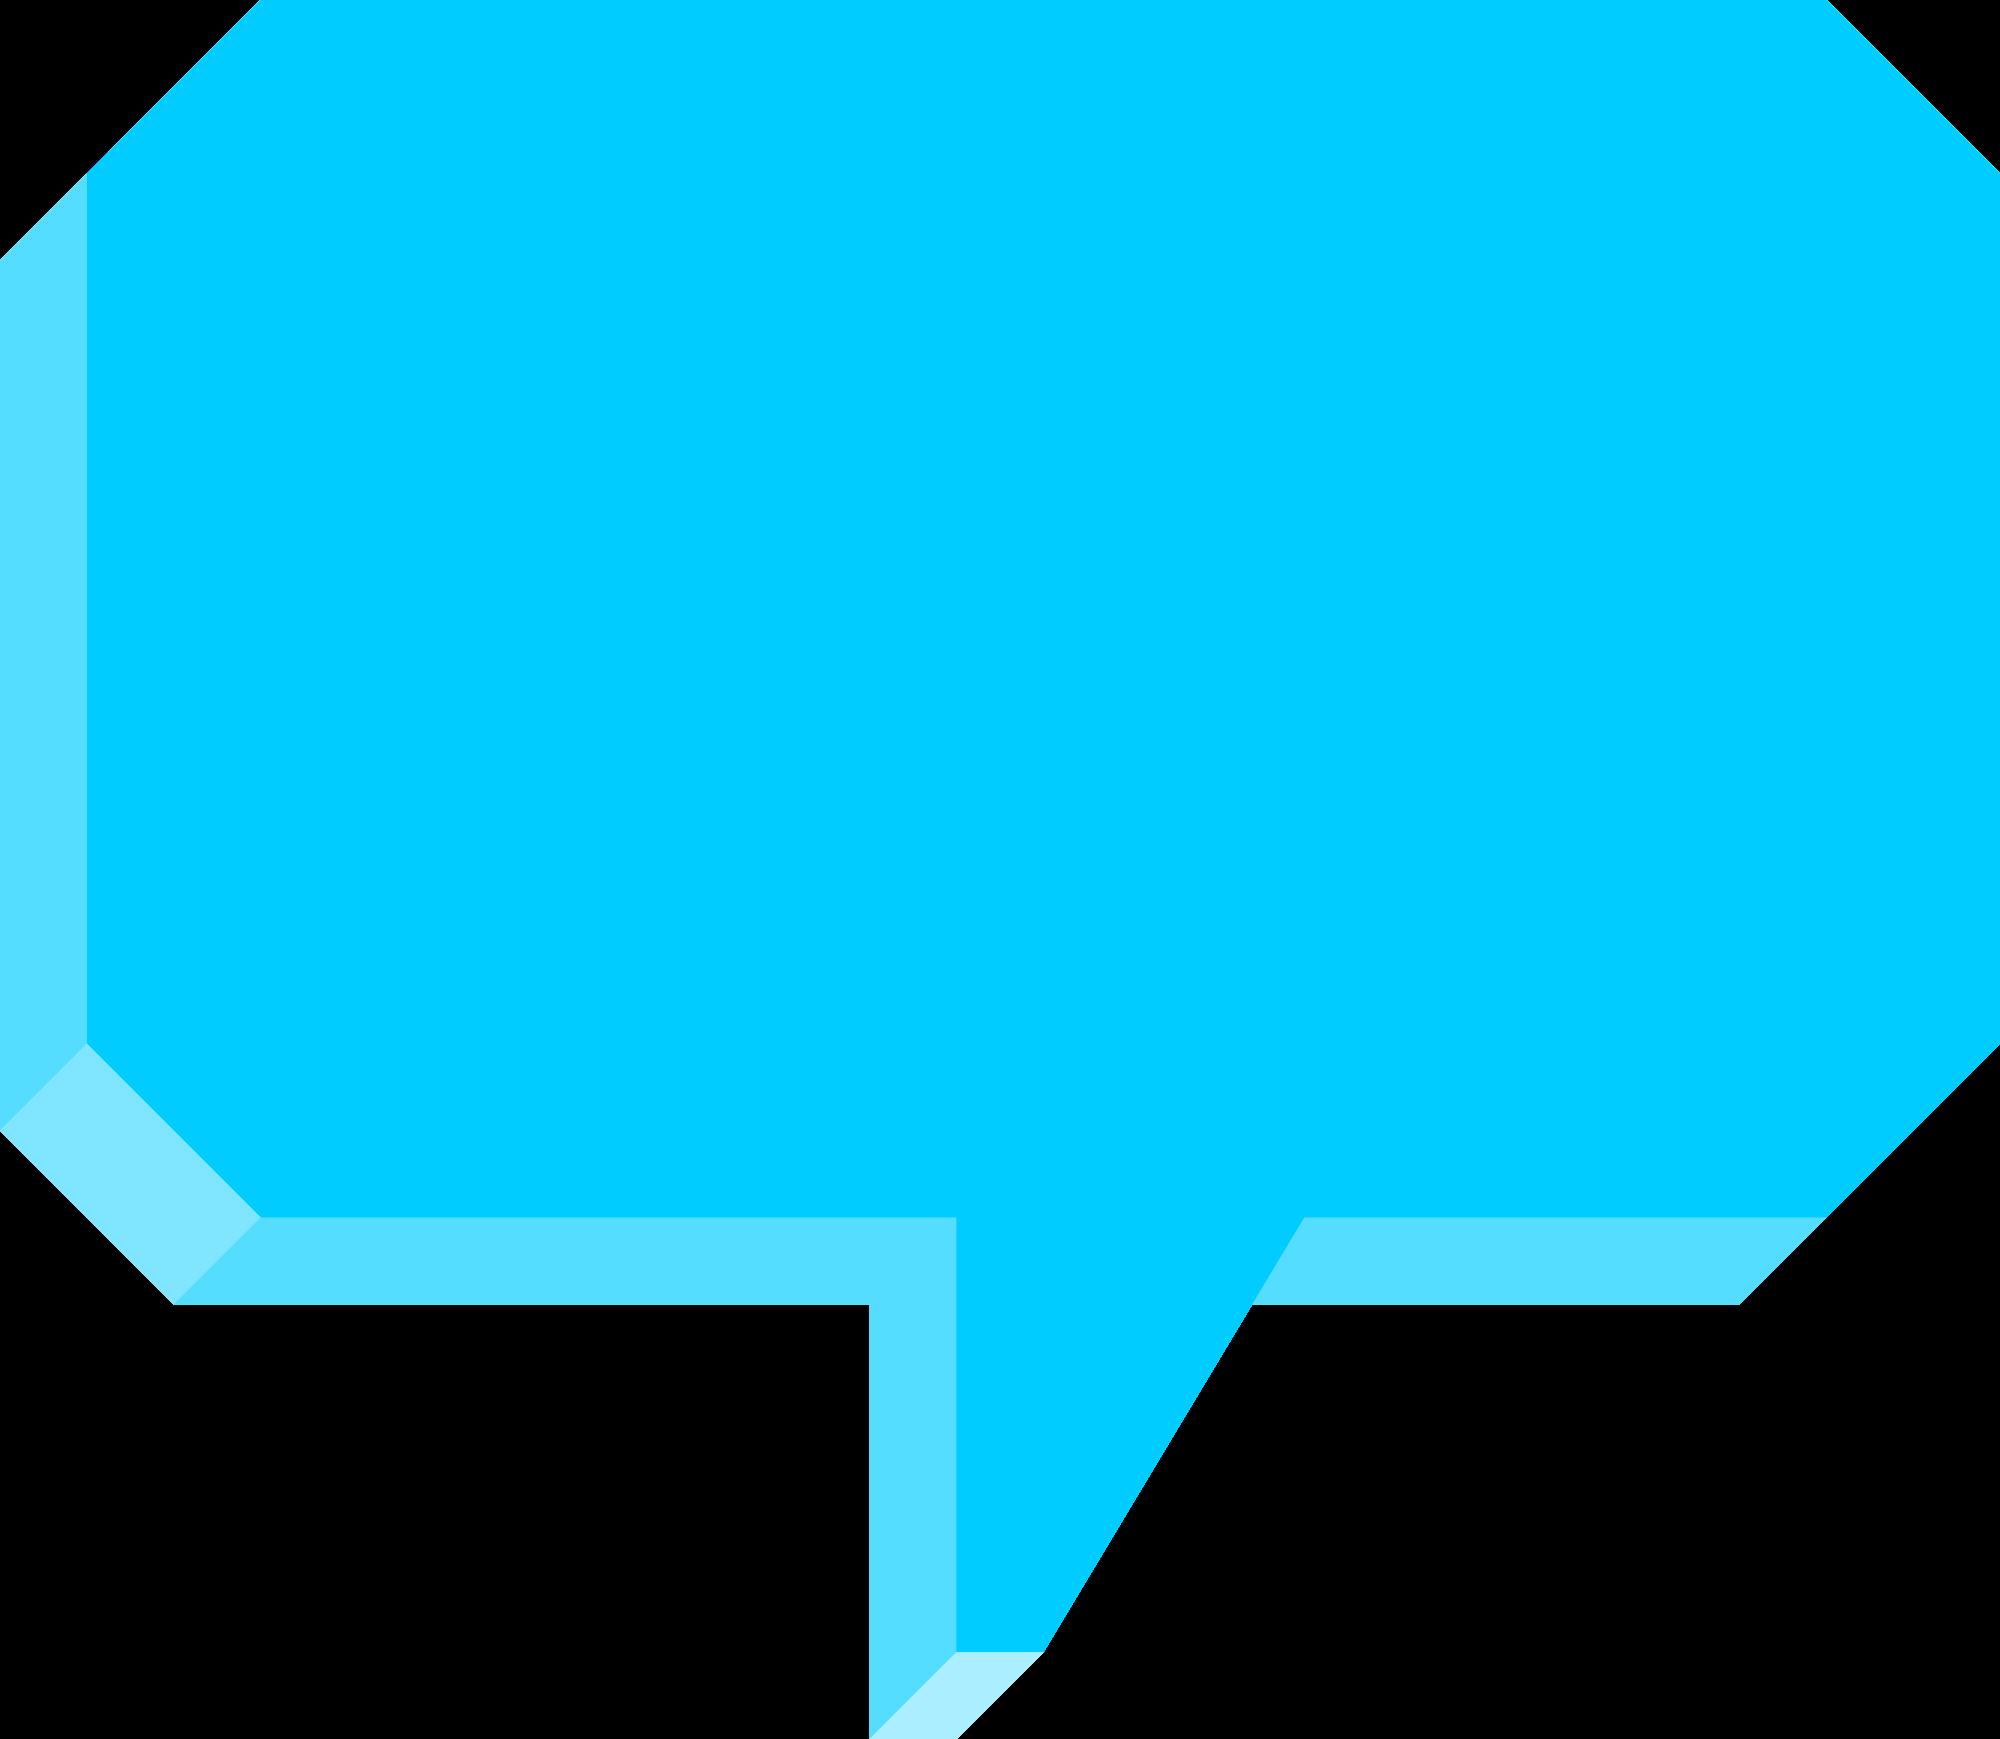 3d speech bubble clipart image library 3D Speech Bubble (PNG Transparent) | OnlyGFX.com image library